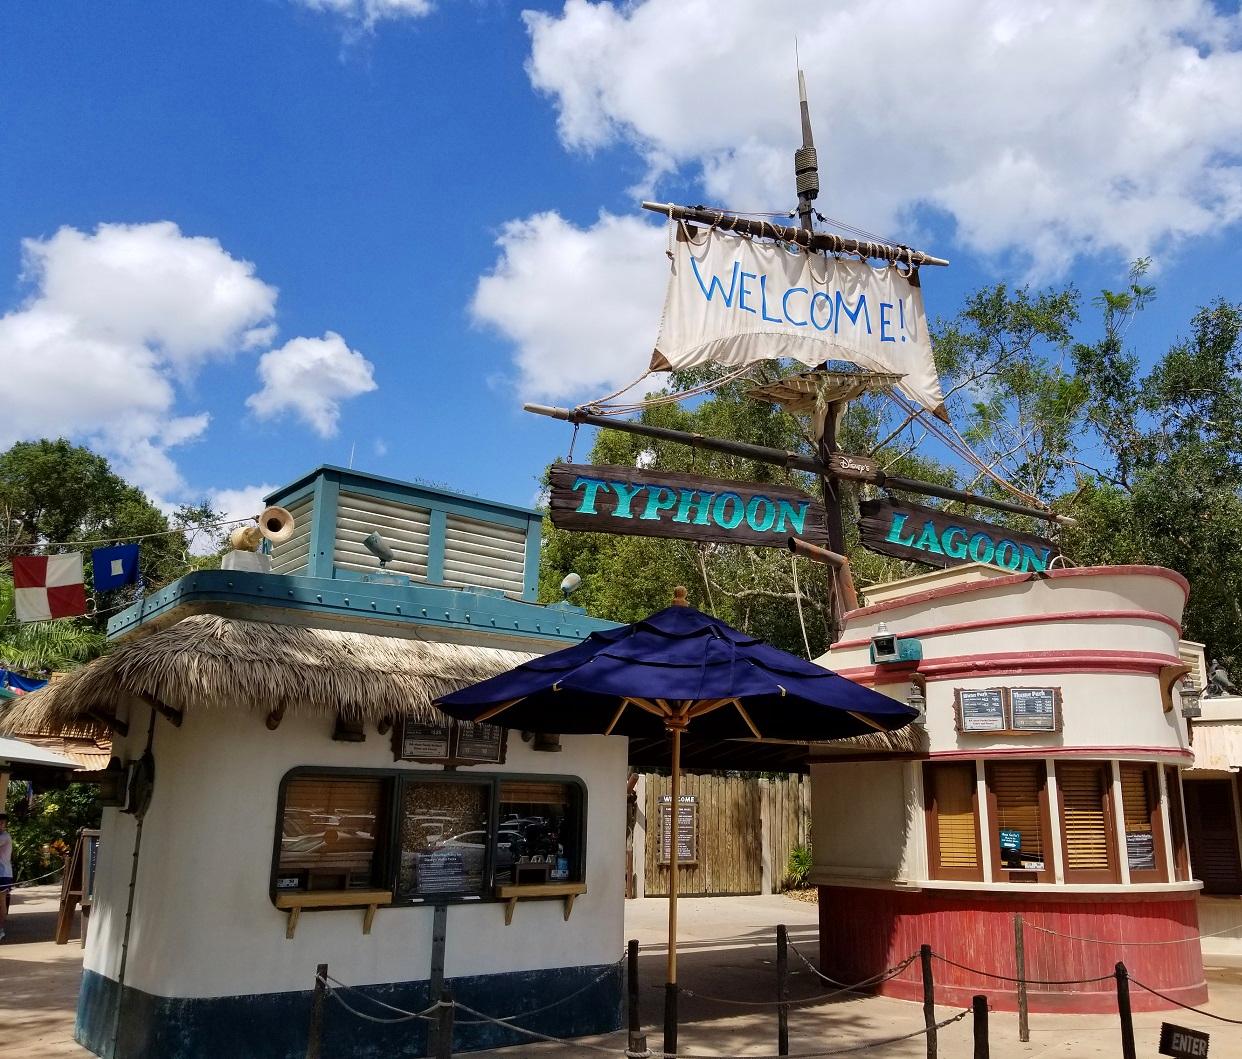 Entrada de Disney's Typhoon Lagoon en Walt Disney World